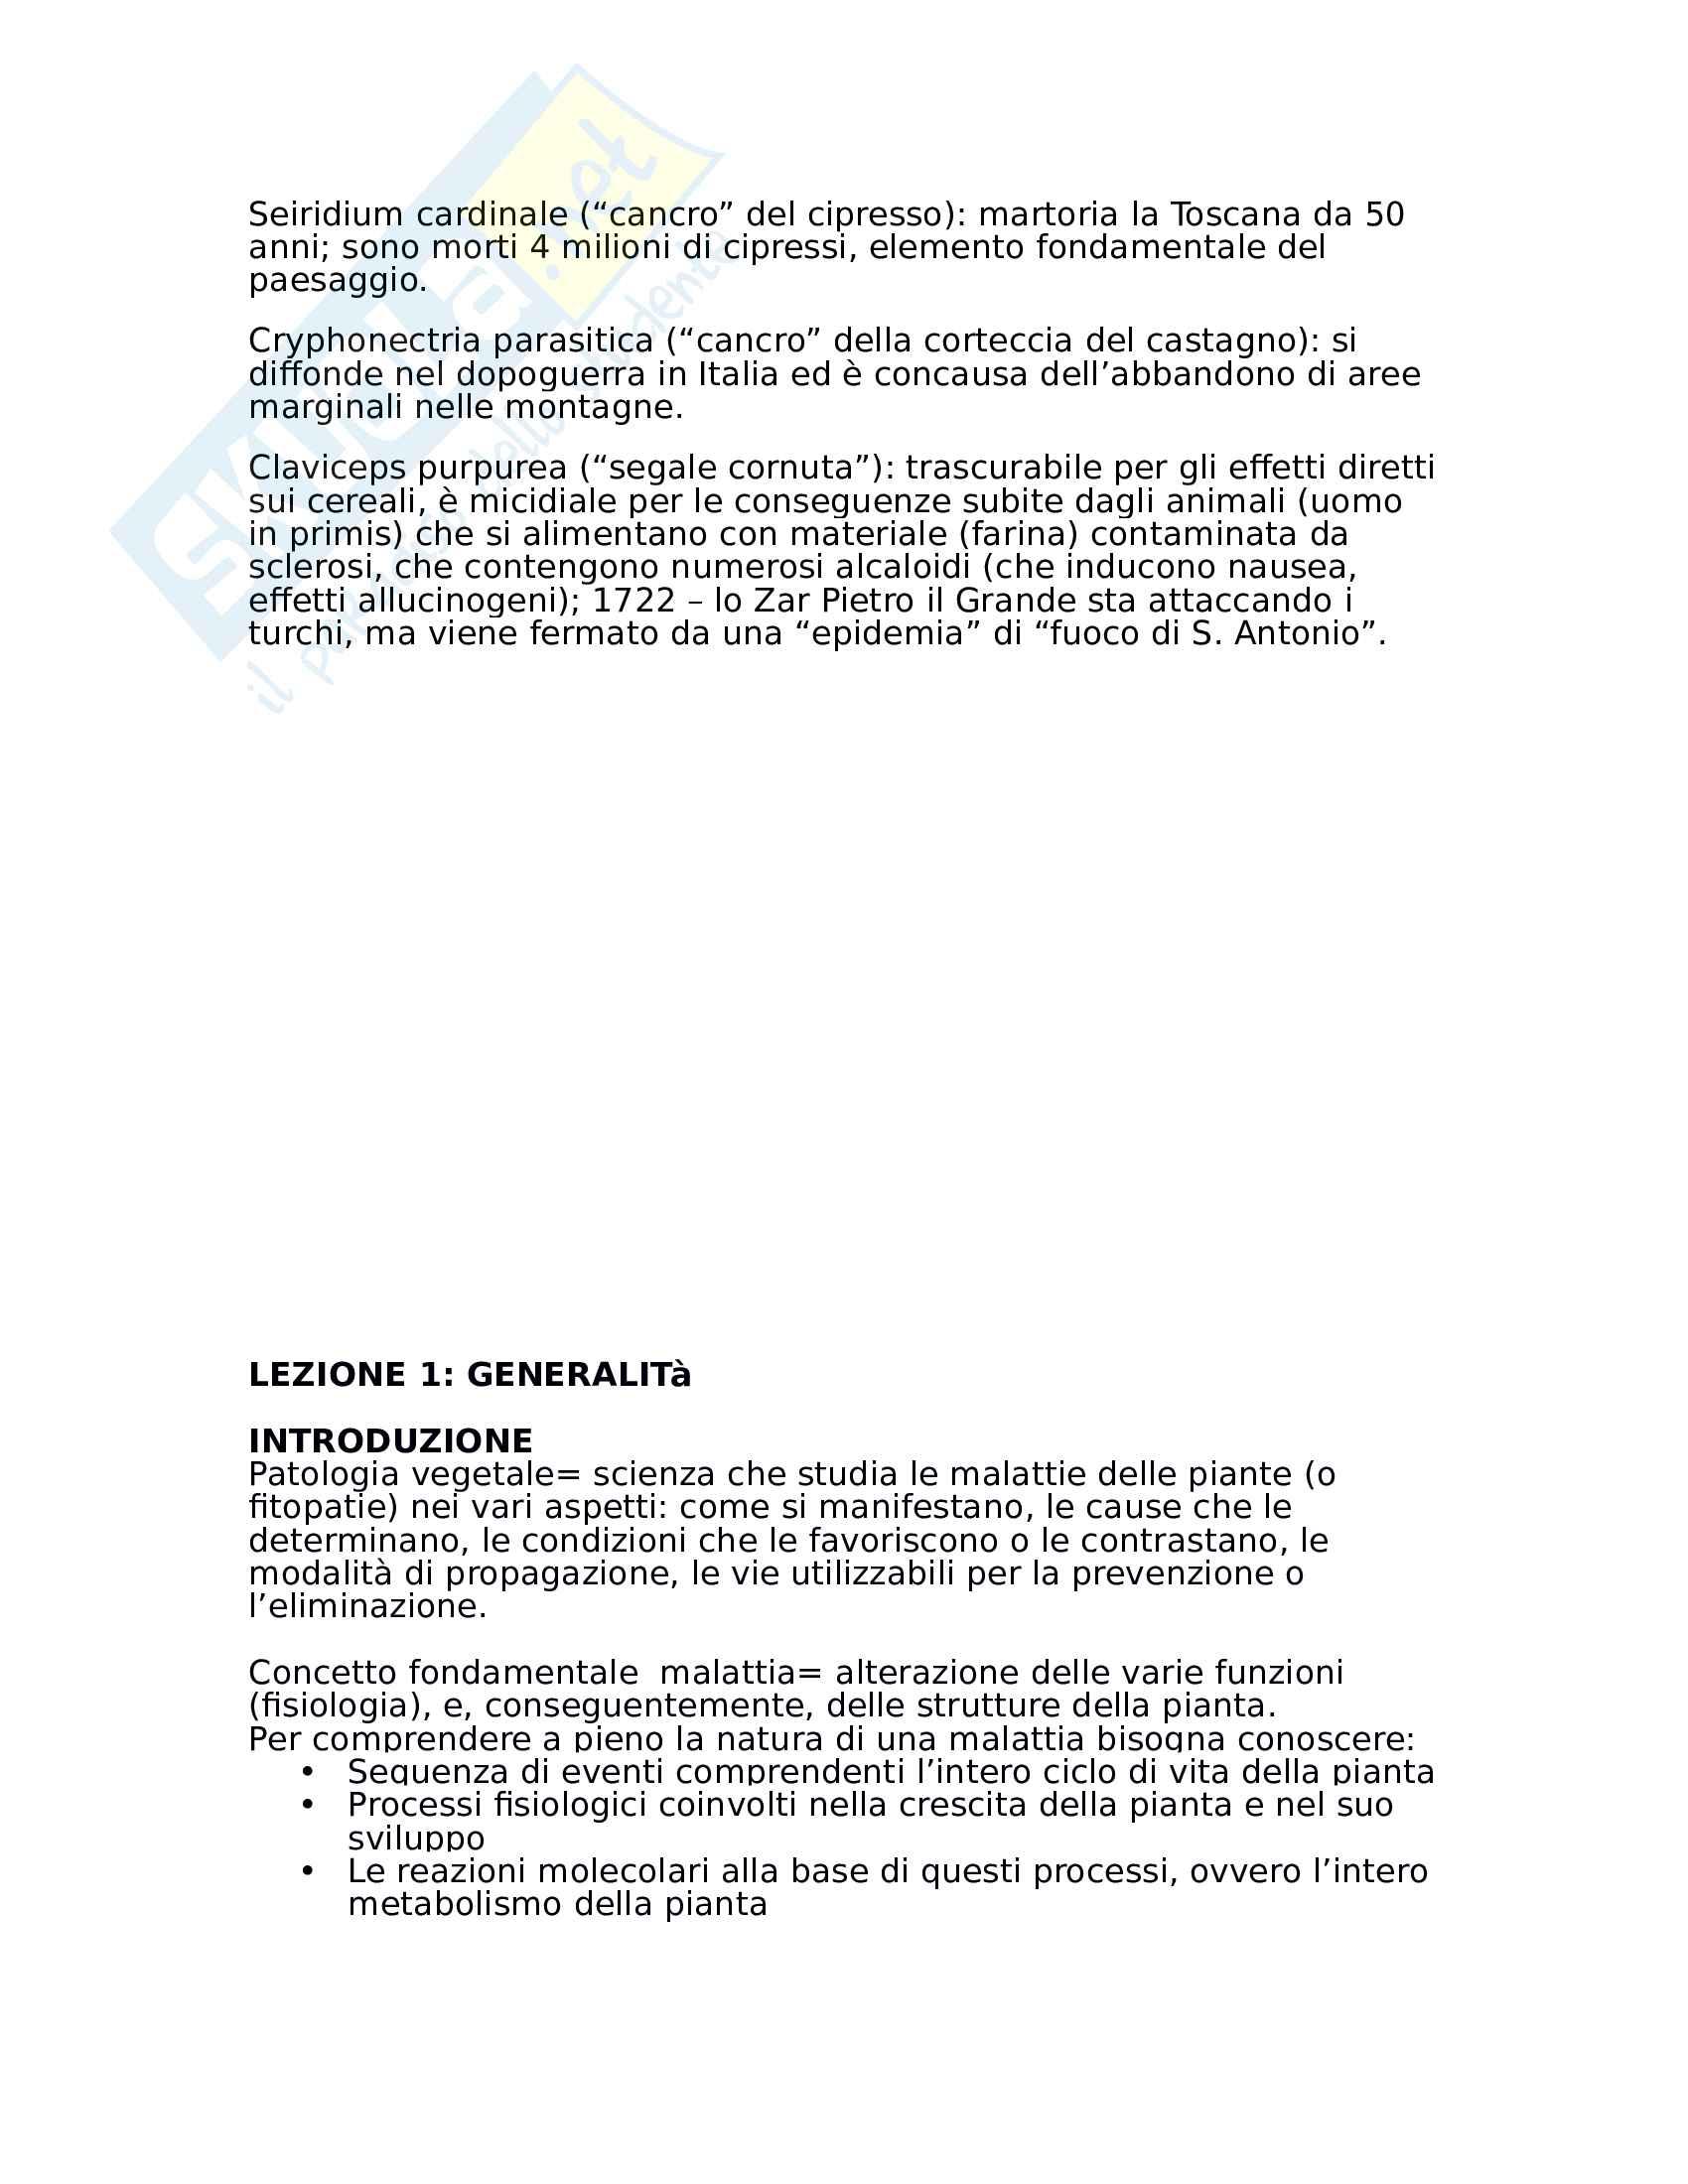 Fitopatologia vegetale Pag. 11